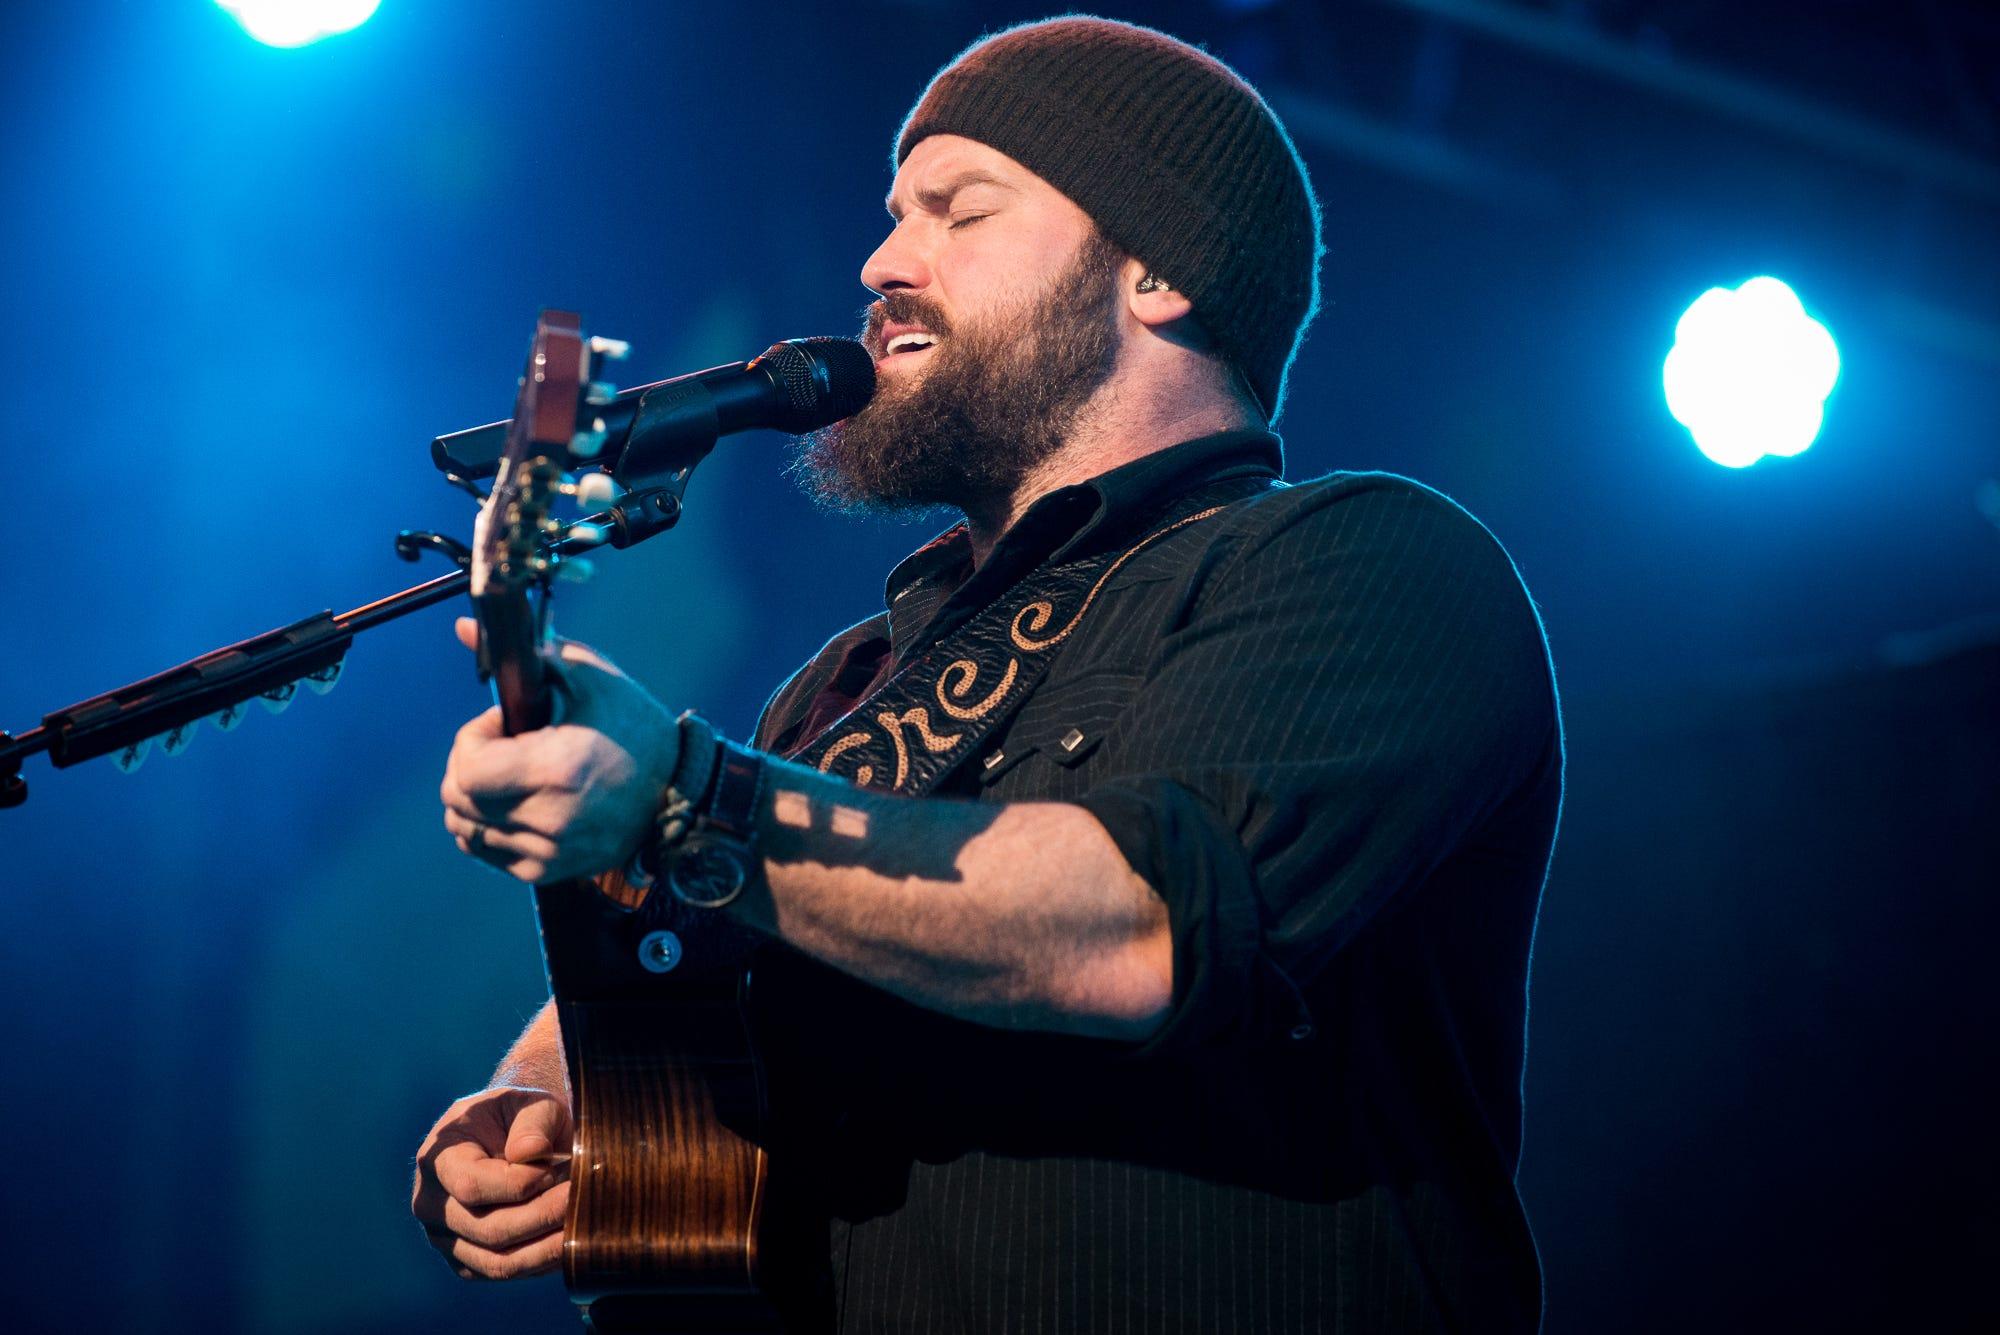 Zac Brown Band, Evanescence, Halestorm announce Cincinnati tour stops